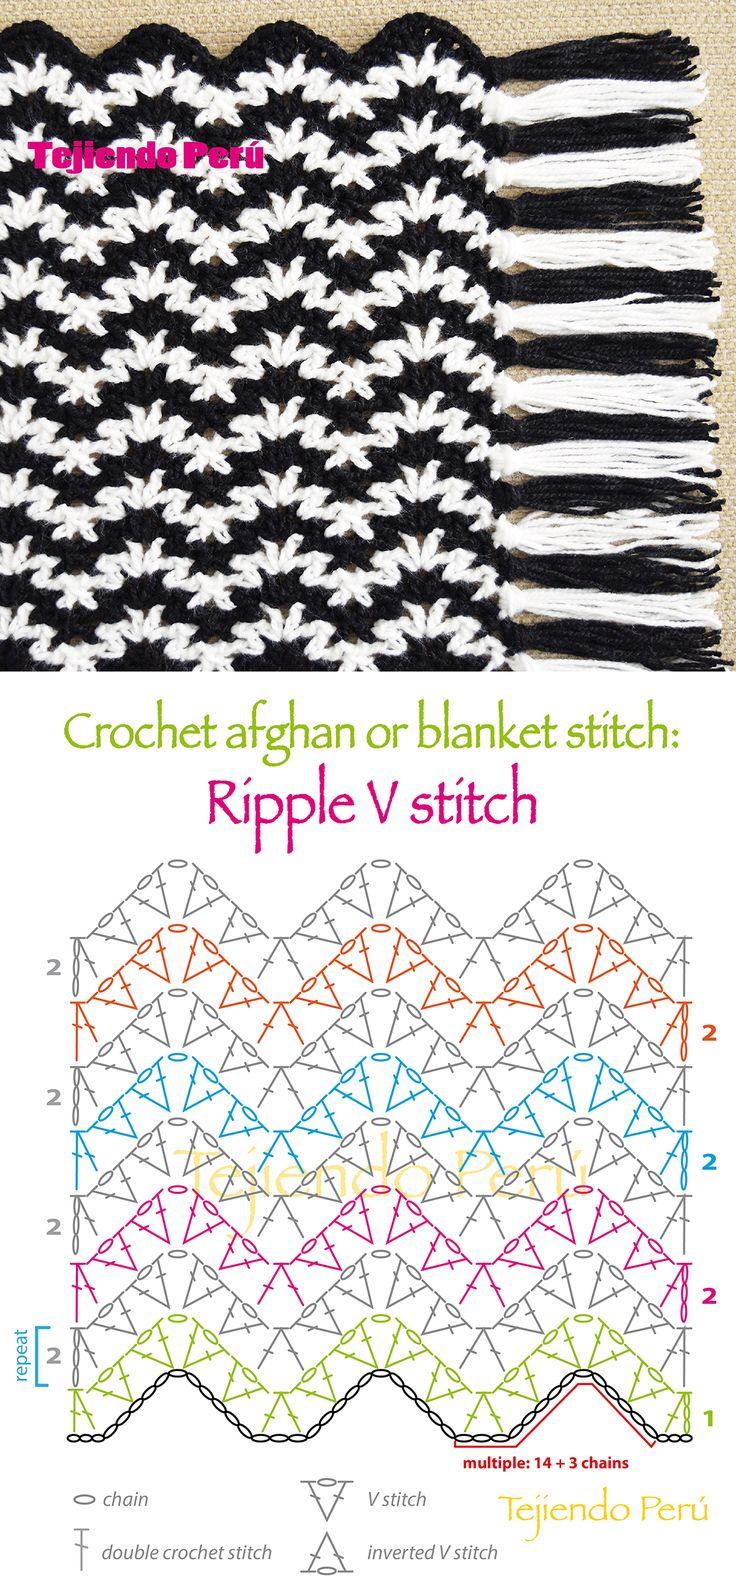 #Crochet: afghan or blanket stitch! Ripple V stitch pattern or chart :)